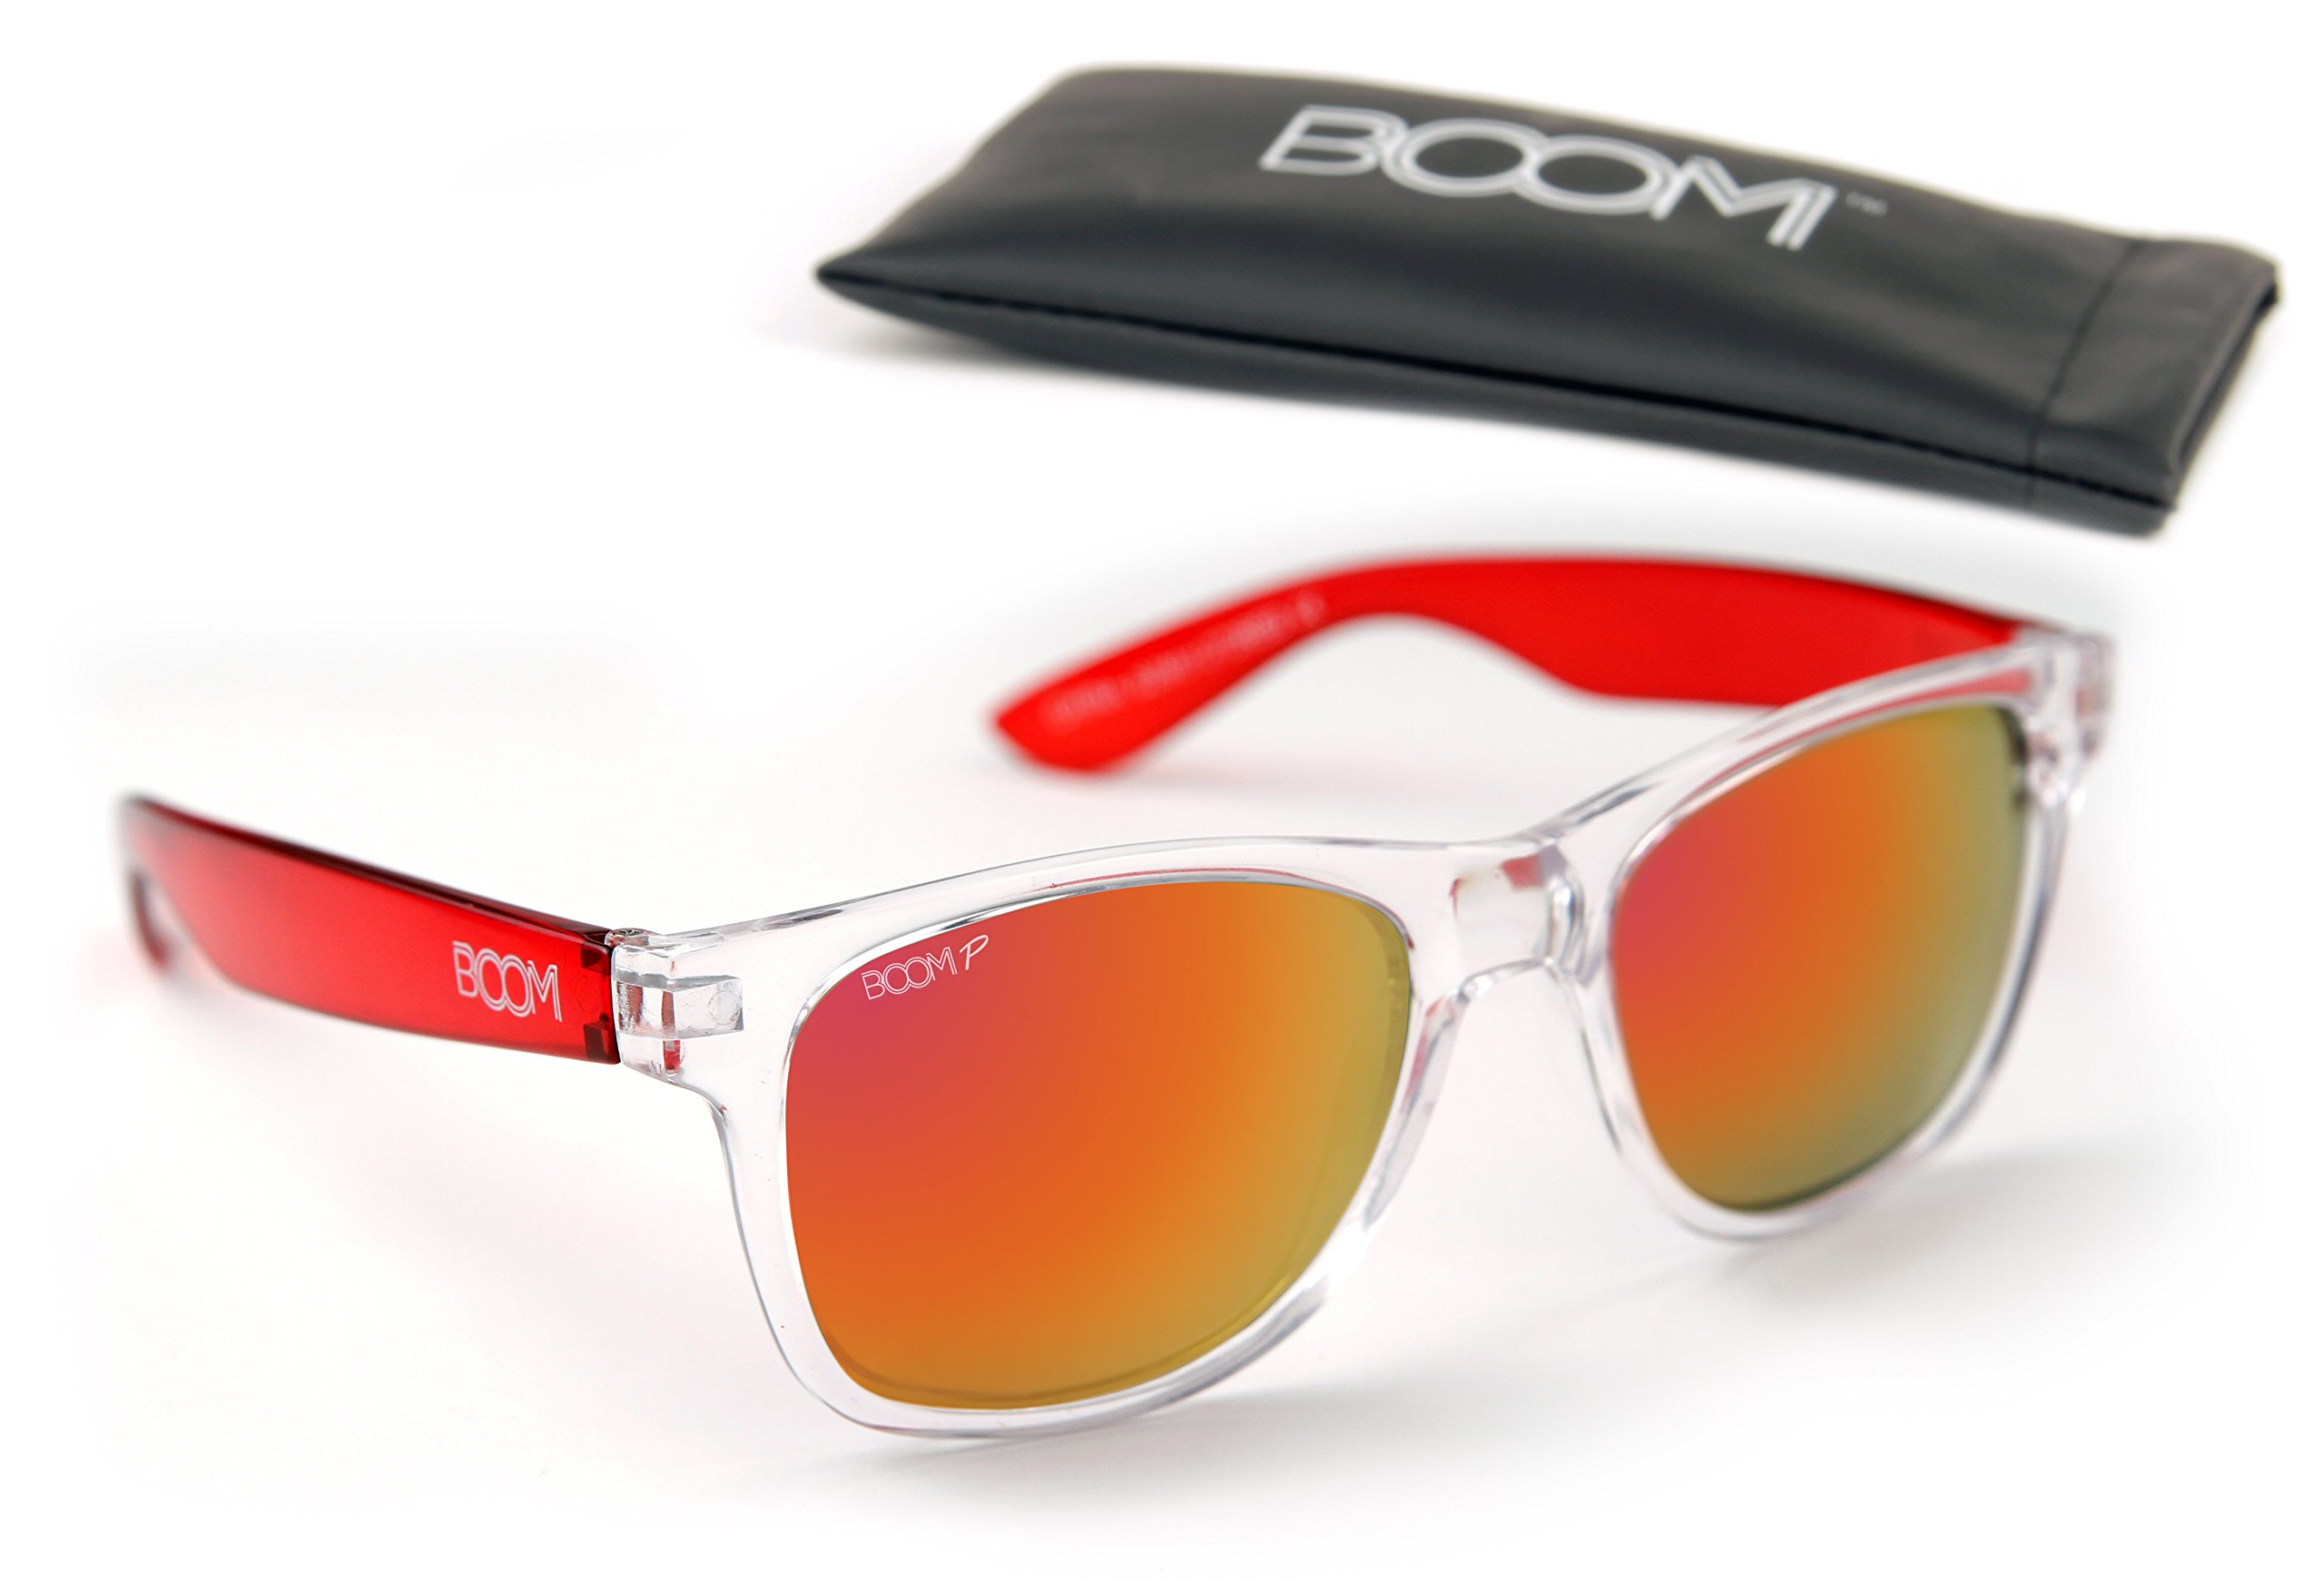 BOOM SPECTRUM Polarized Sunglasses - CHERRY BOMB